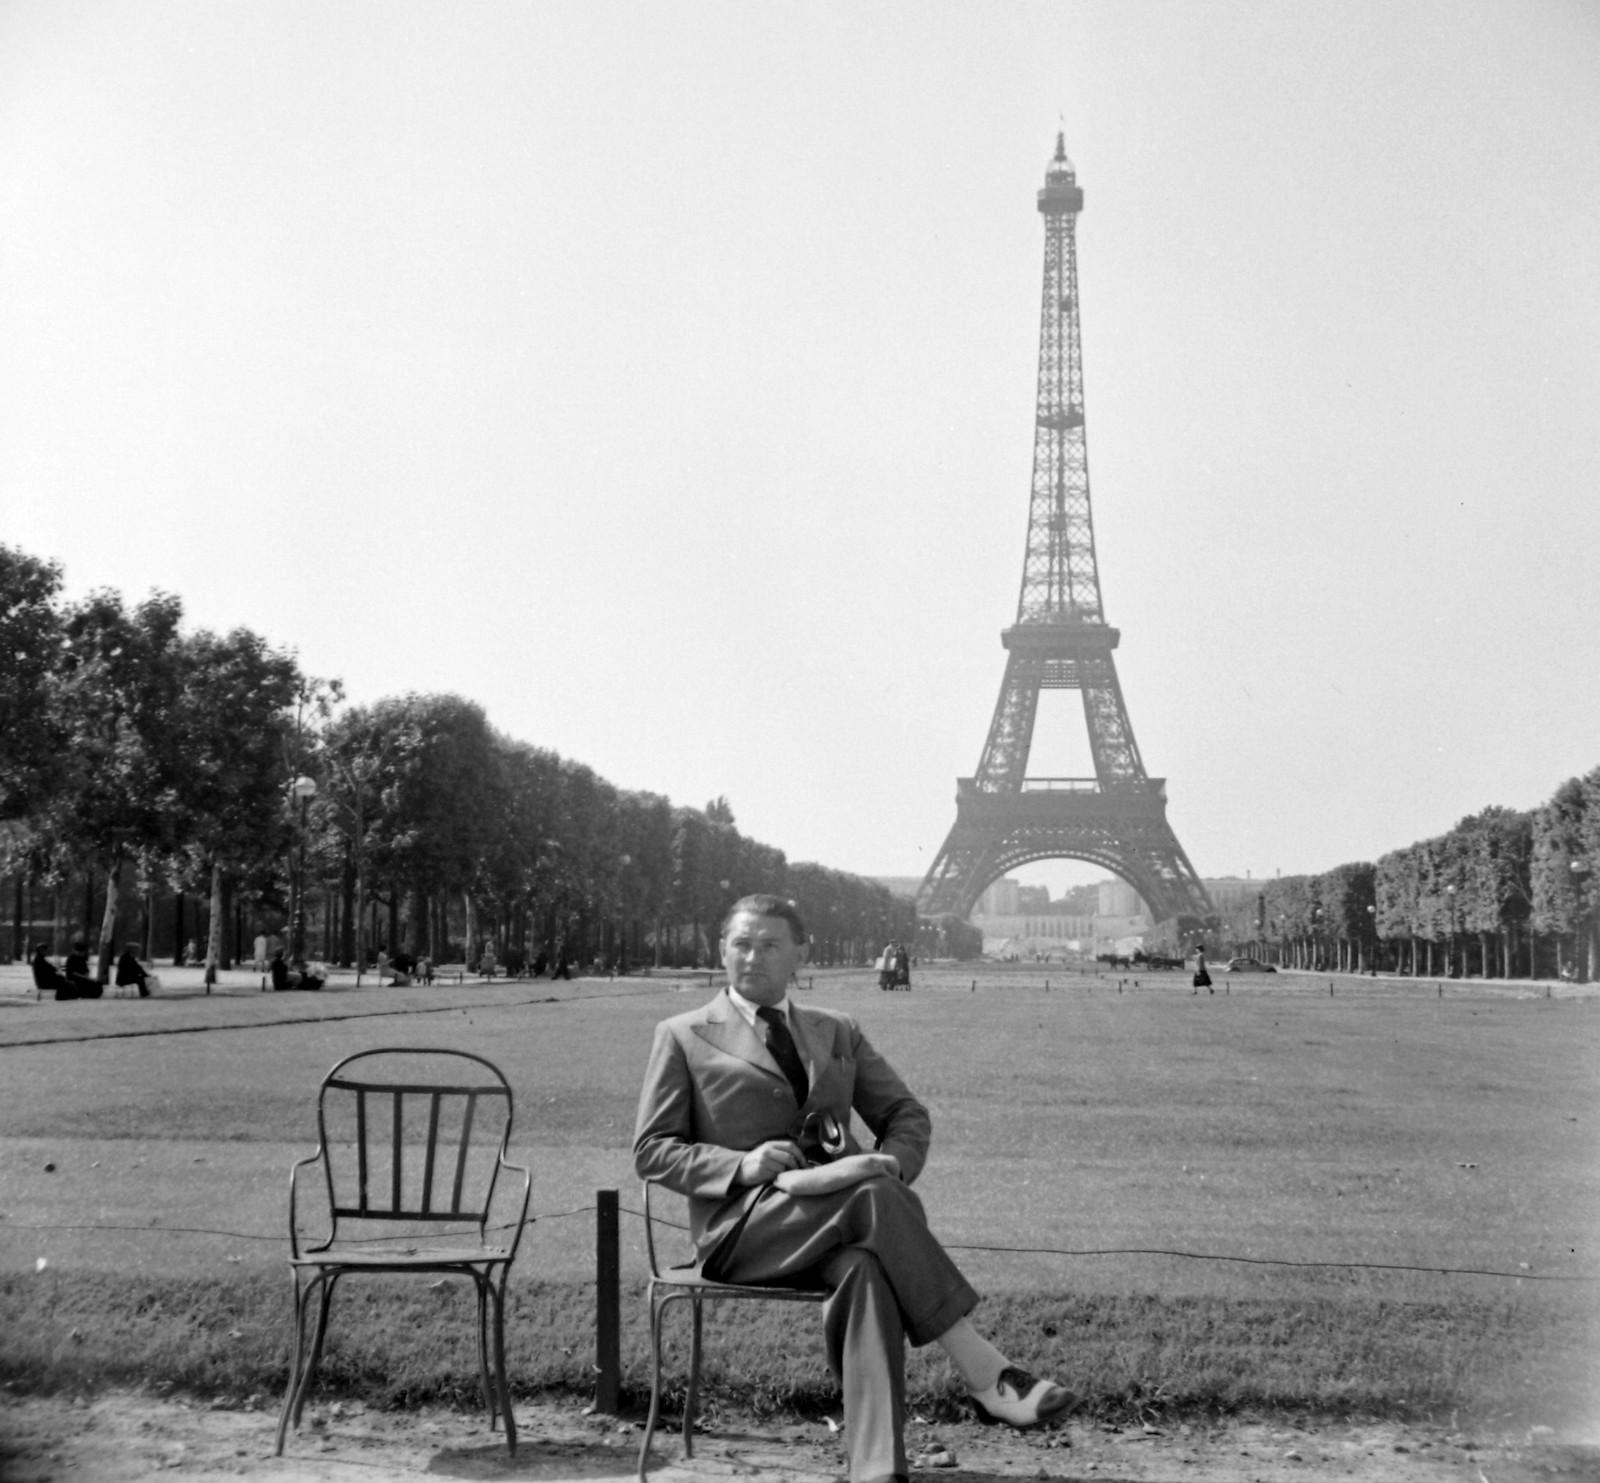 1939. Эйфелева башня